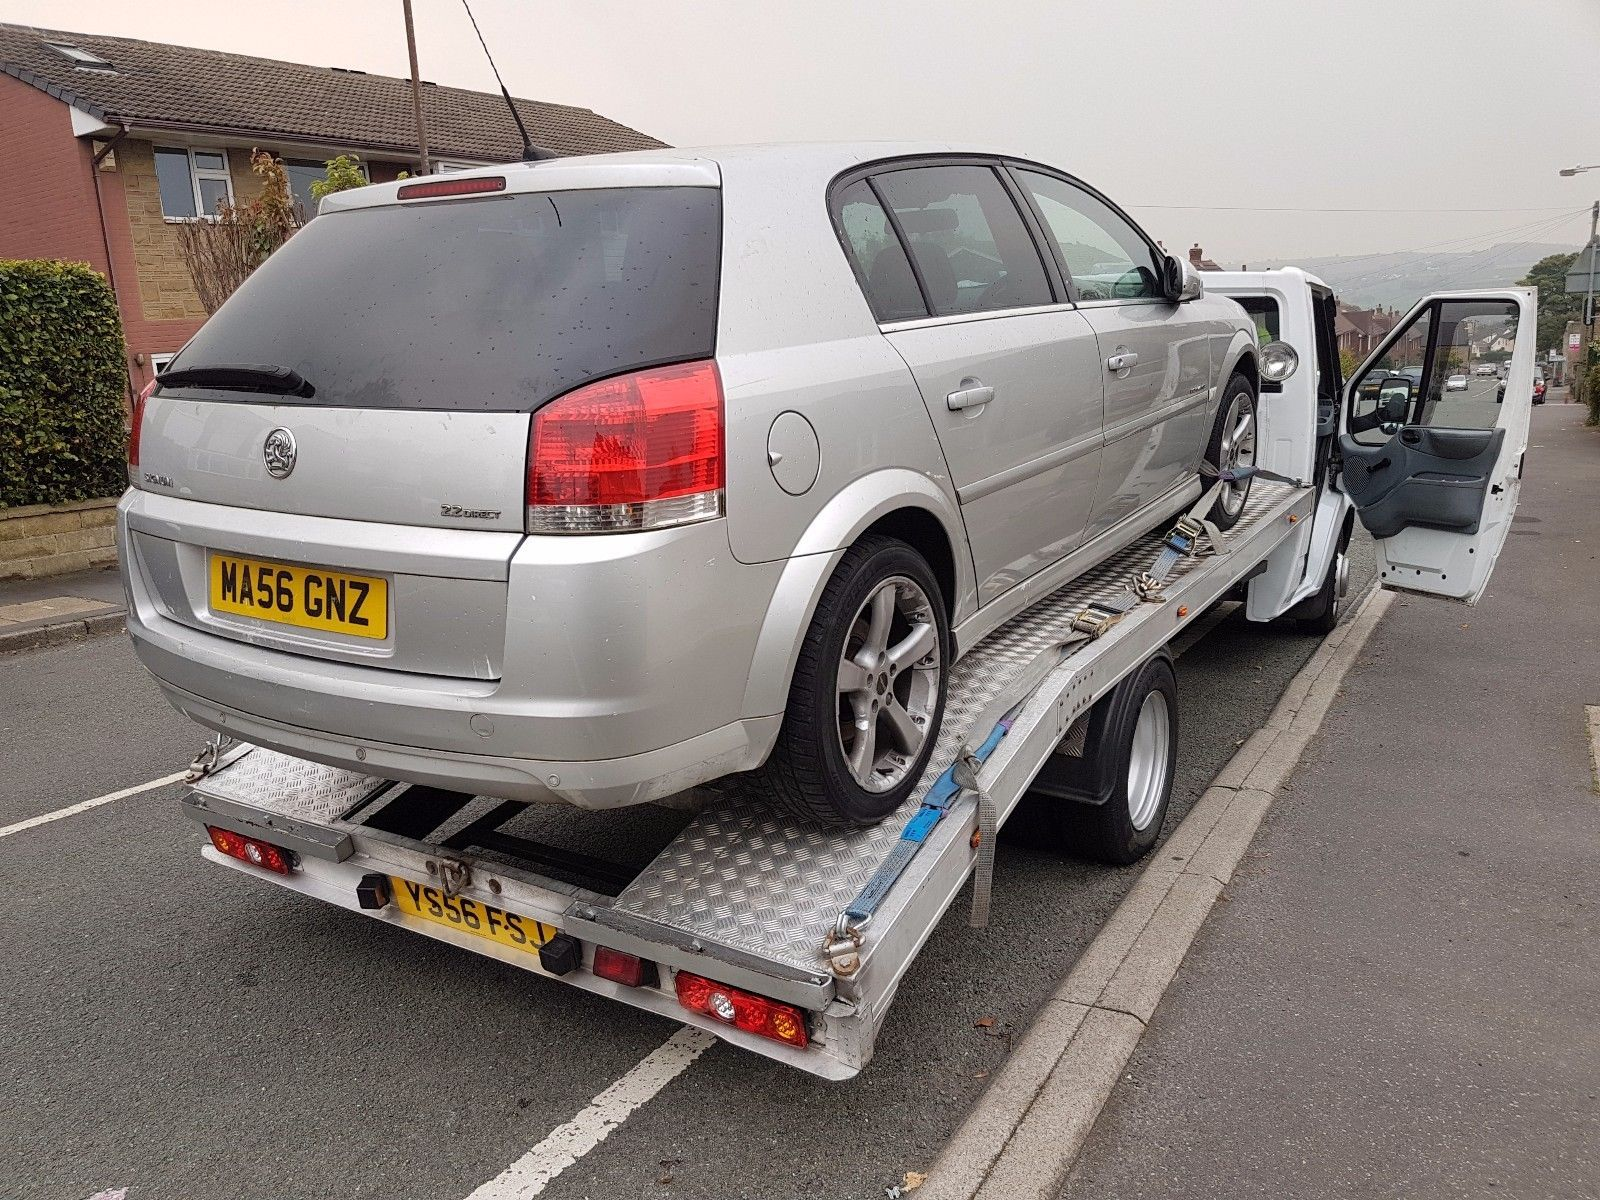 eBay: Vauxhall signum 2.2 petrol spares or repair 3 DAY AUCTION ...